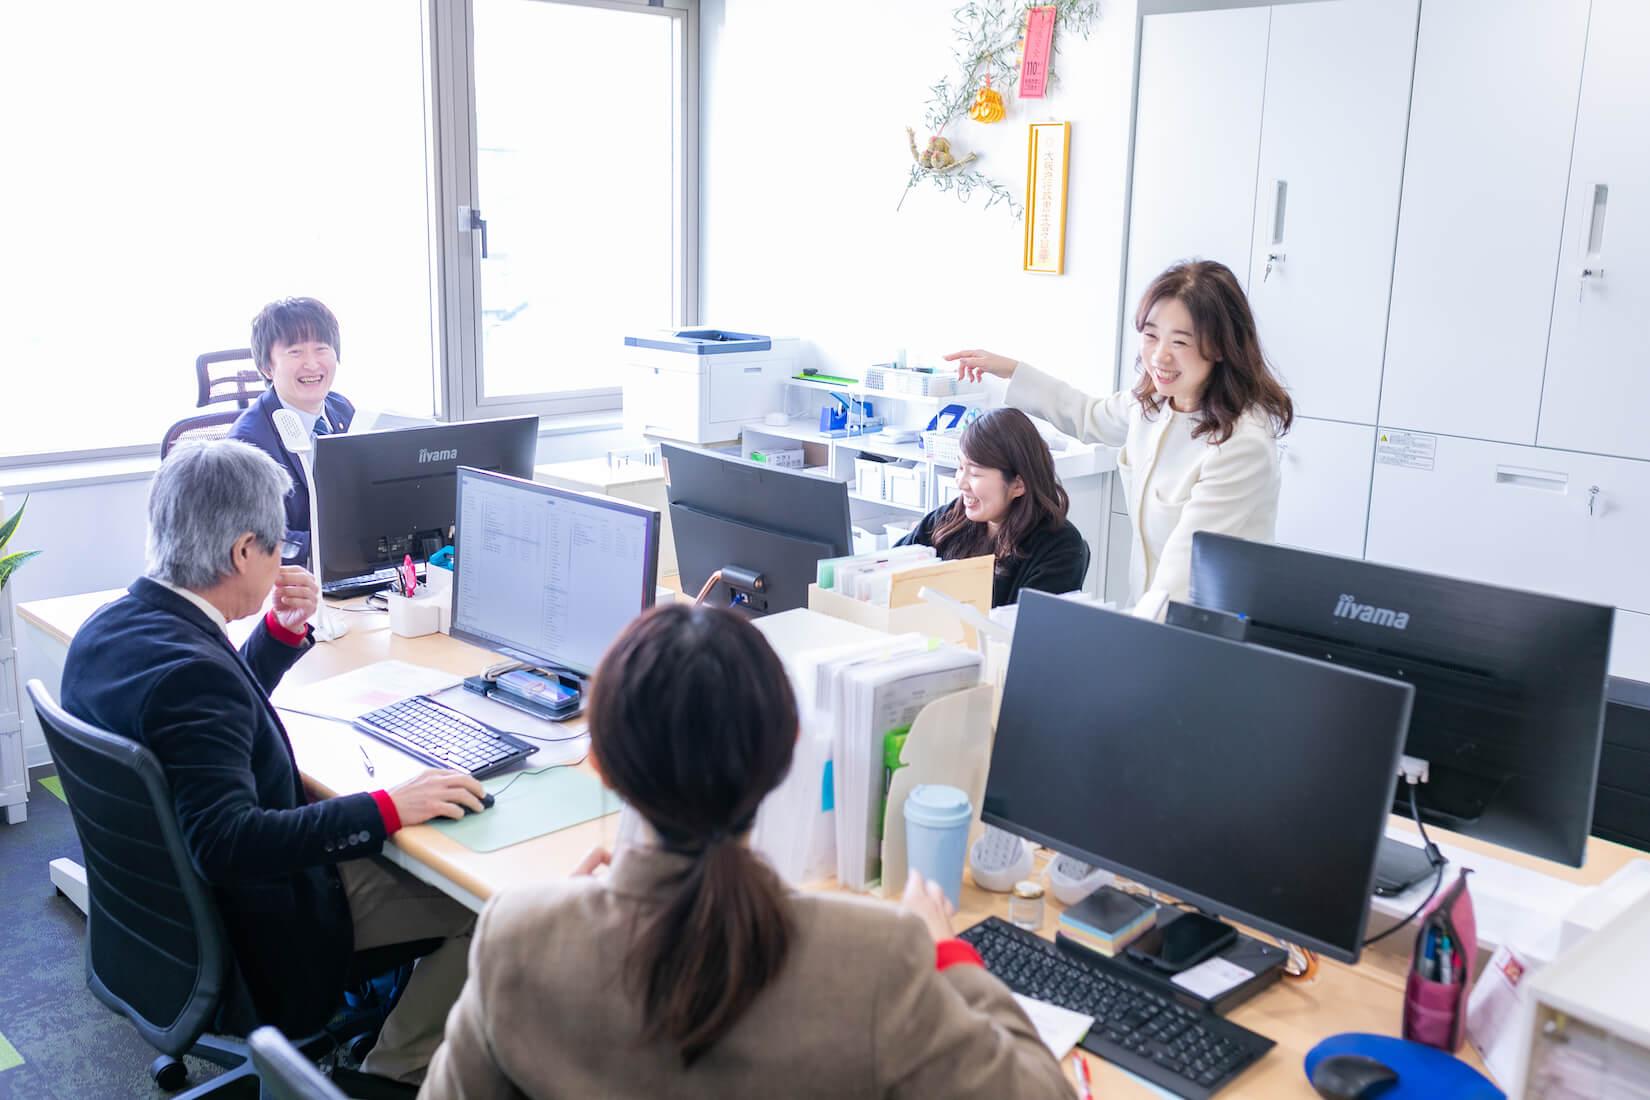 Stock(ストック)インタビュー澤田様、戸川様写真